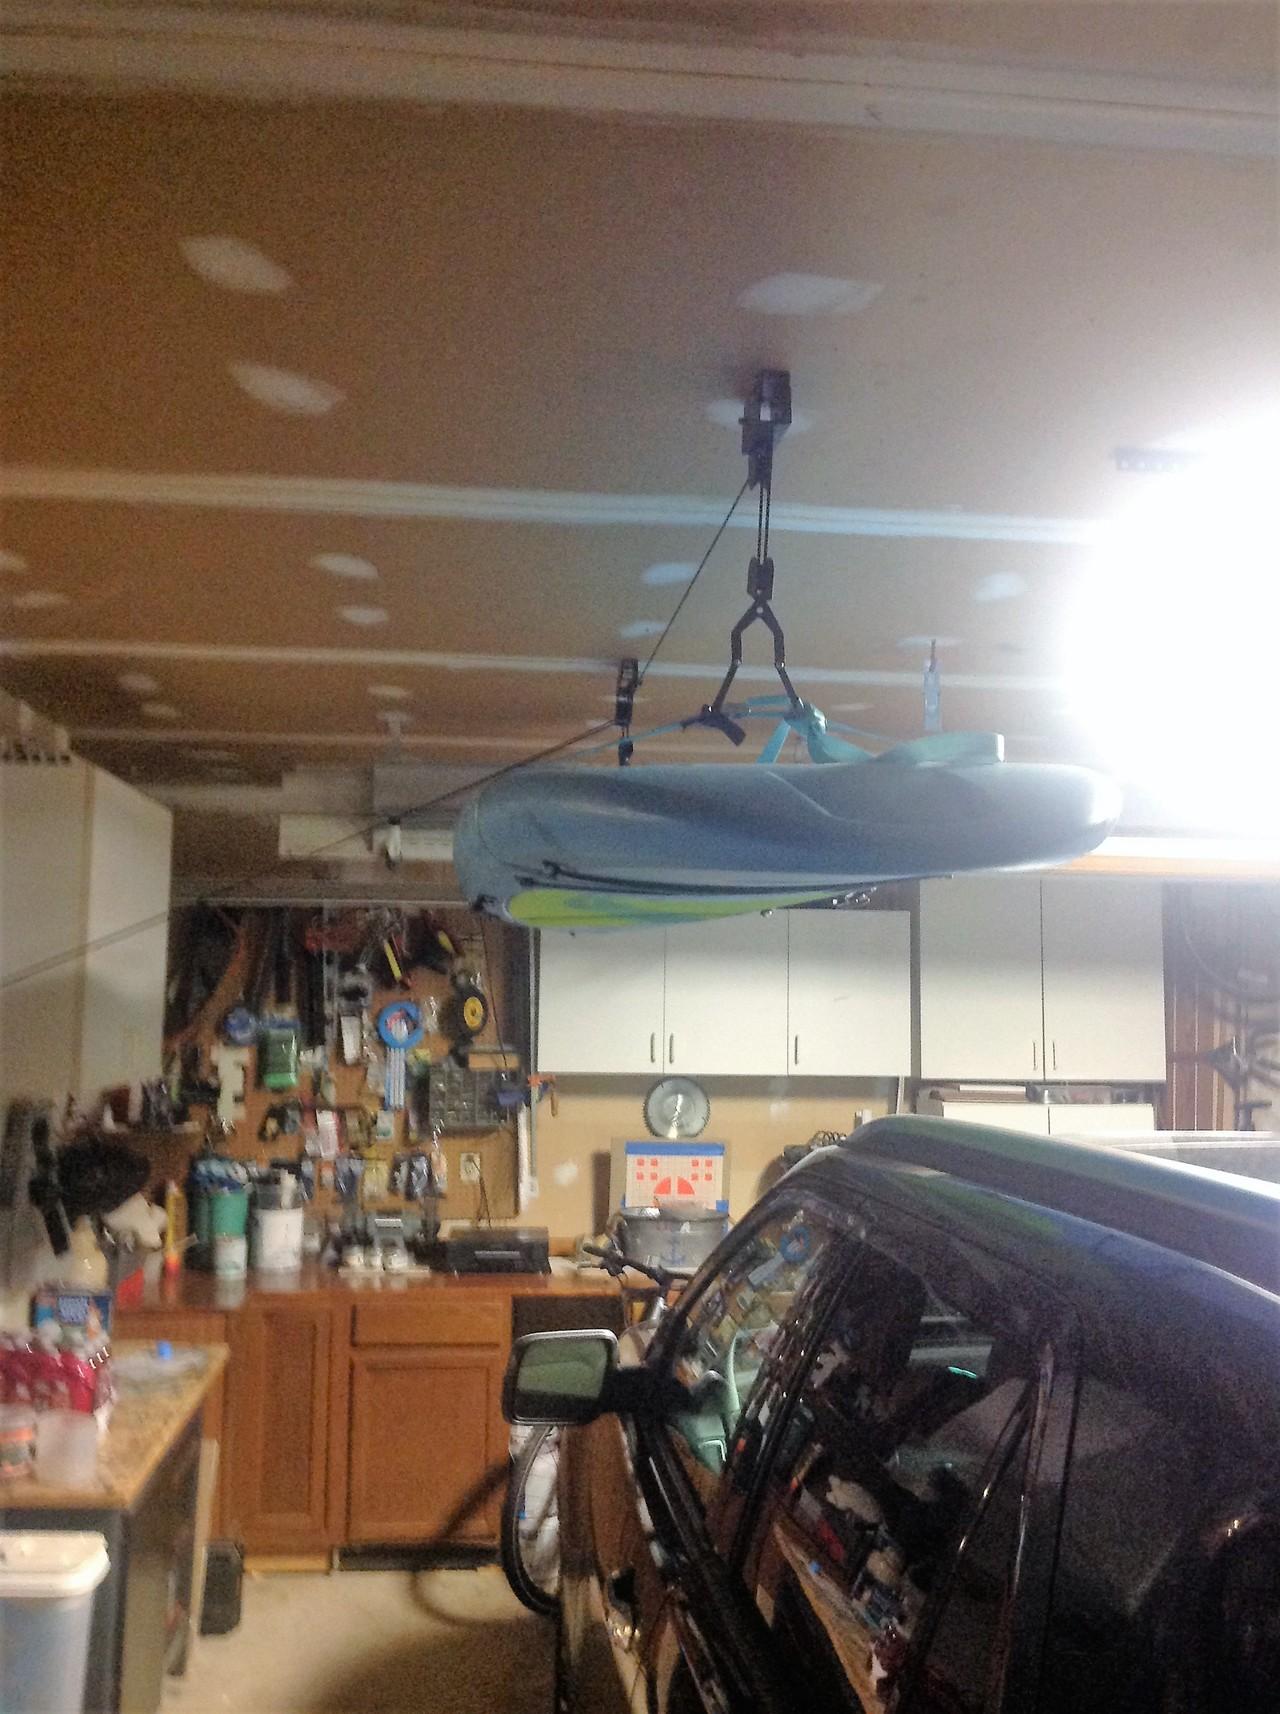 gs gmbh motorized index cfm kindermann ceilings ceiling lift pro for avcat